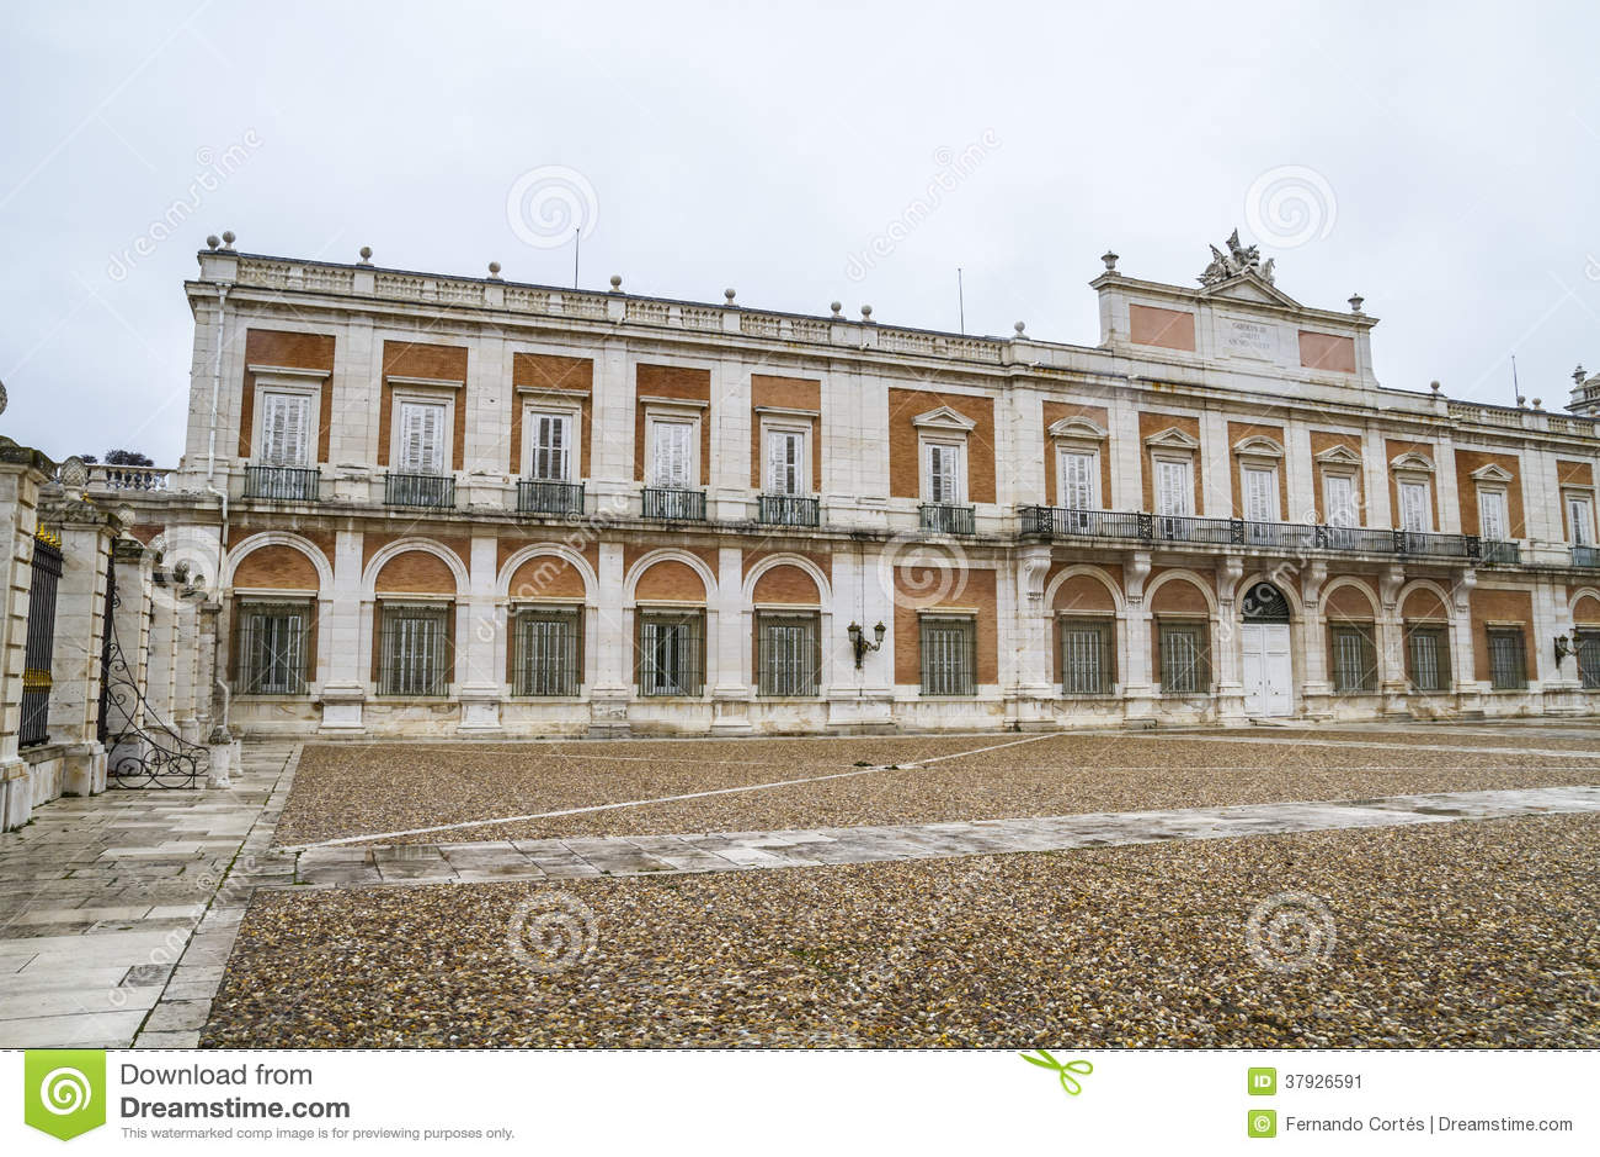 Fachada principal. O palácio de Aranjuez, Madri, herança de Spain.World senta-se